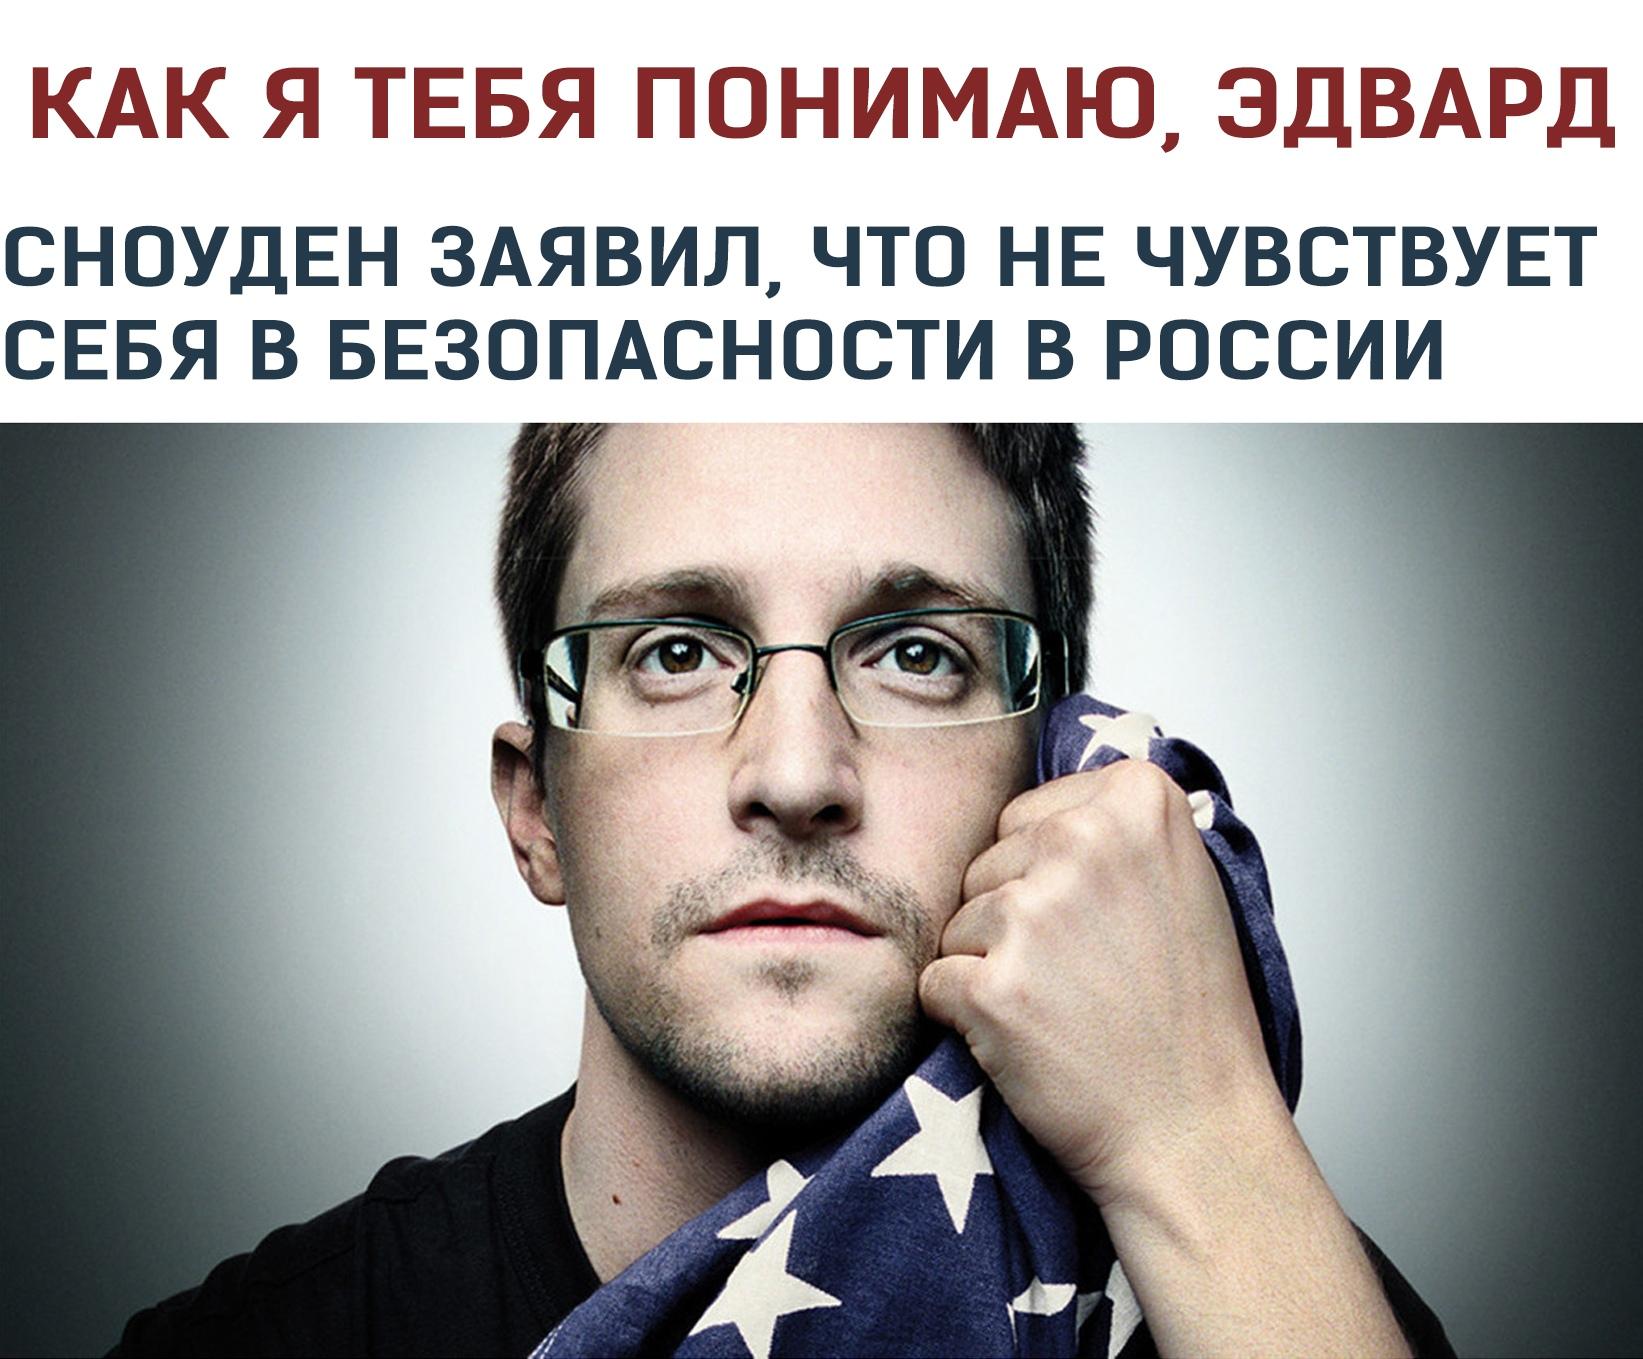 https://pp.userapi.com/c851228/v851228608/271ec/qfKq0IsxXjc.jpg